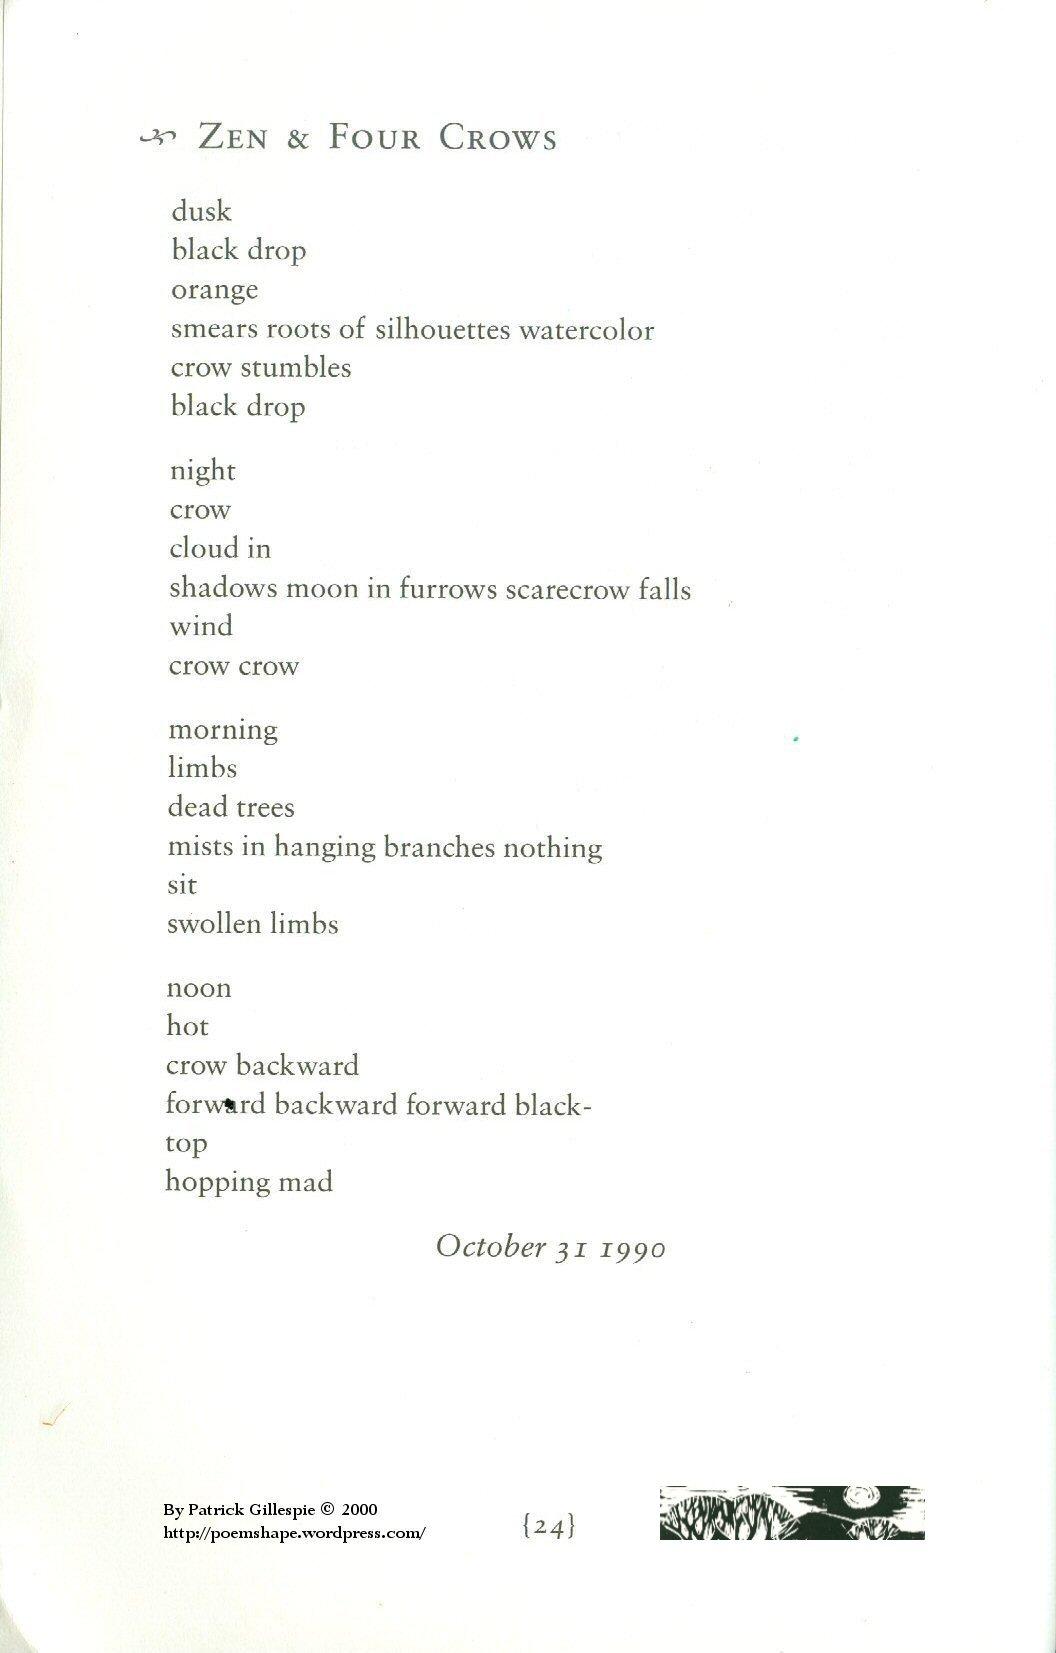 Page 24 - Zen & Four Crows